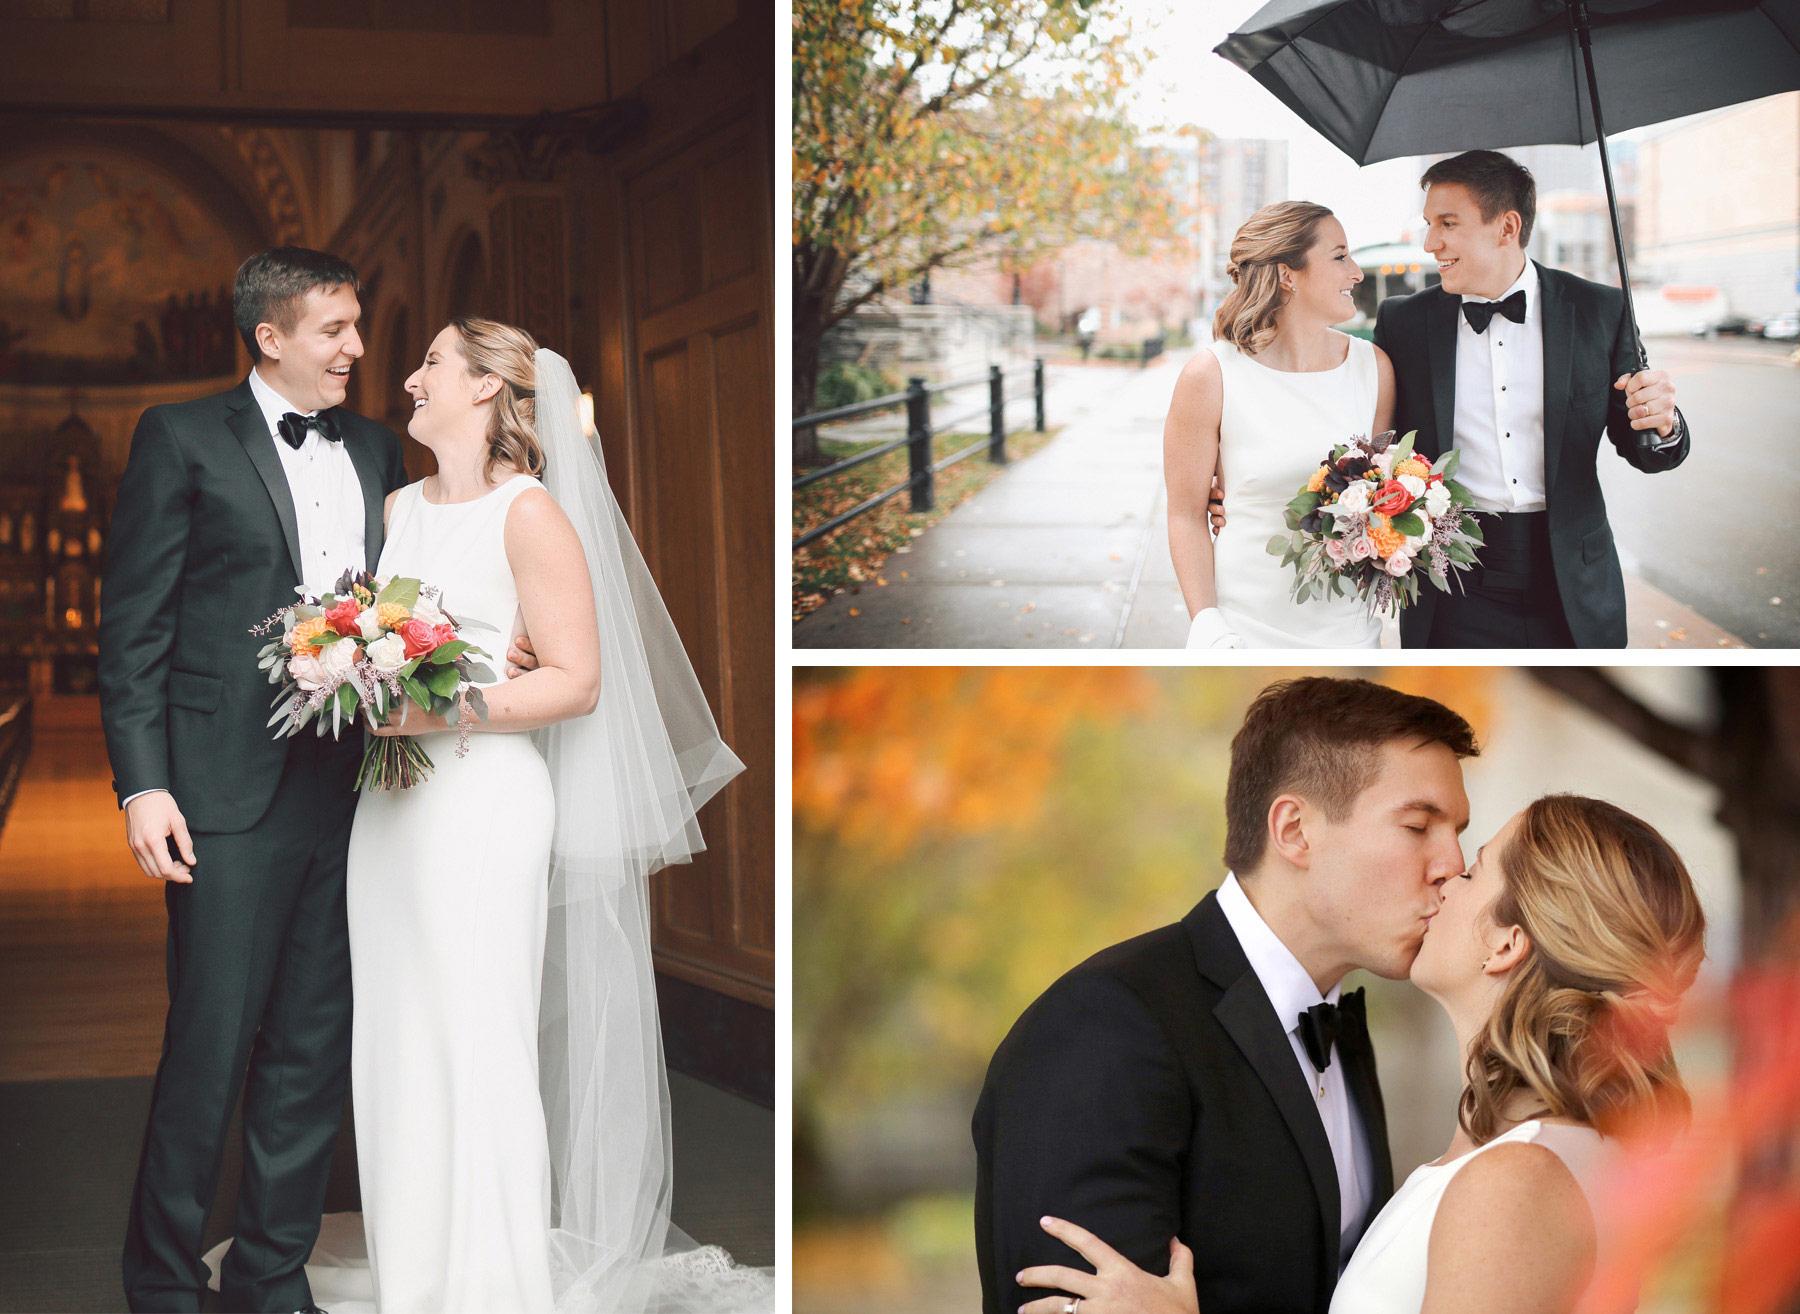 10-Saint-Paul-Minnesota-Wedding-Photographer-by-Andrew-Vick-Photography-Fall-Autumn-Church-of-the-Assumption-Ceremony-Bride-Groom-Rice-Park-Umbrella-Rain-Kiss-Vintage-Kathryn-and-Sam.jpg